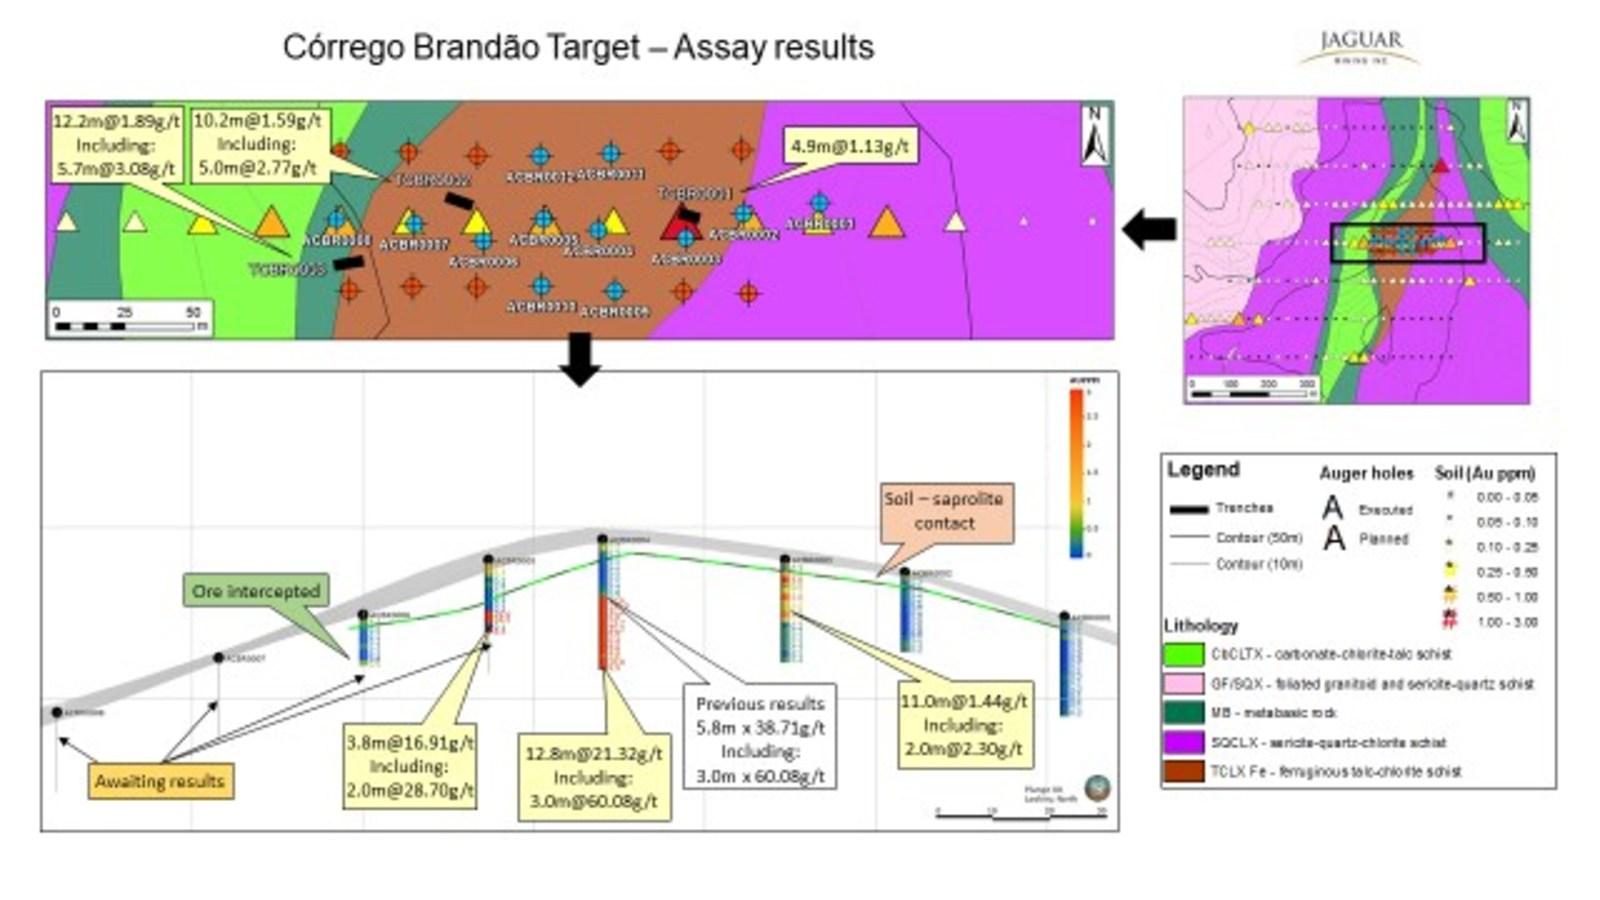 Figure 8. Córrego Brandão Target - Exploration Results.